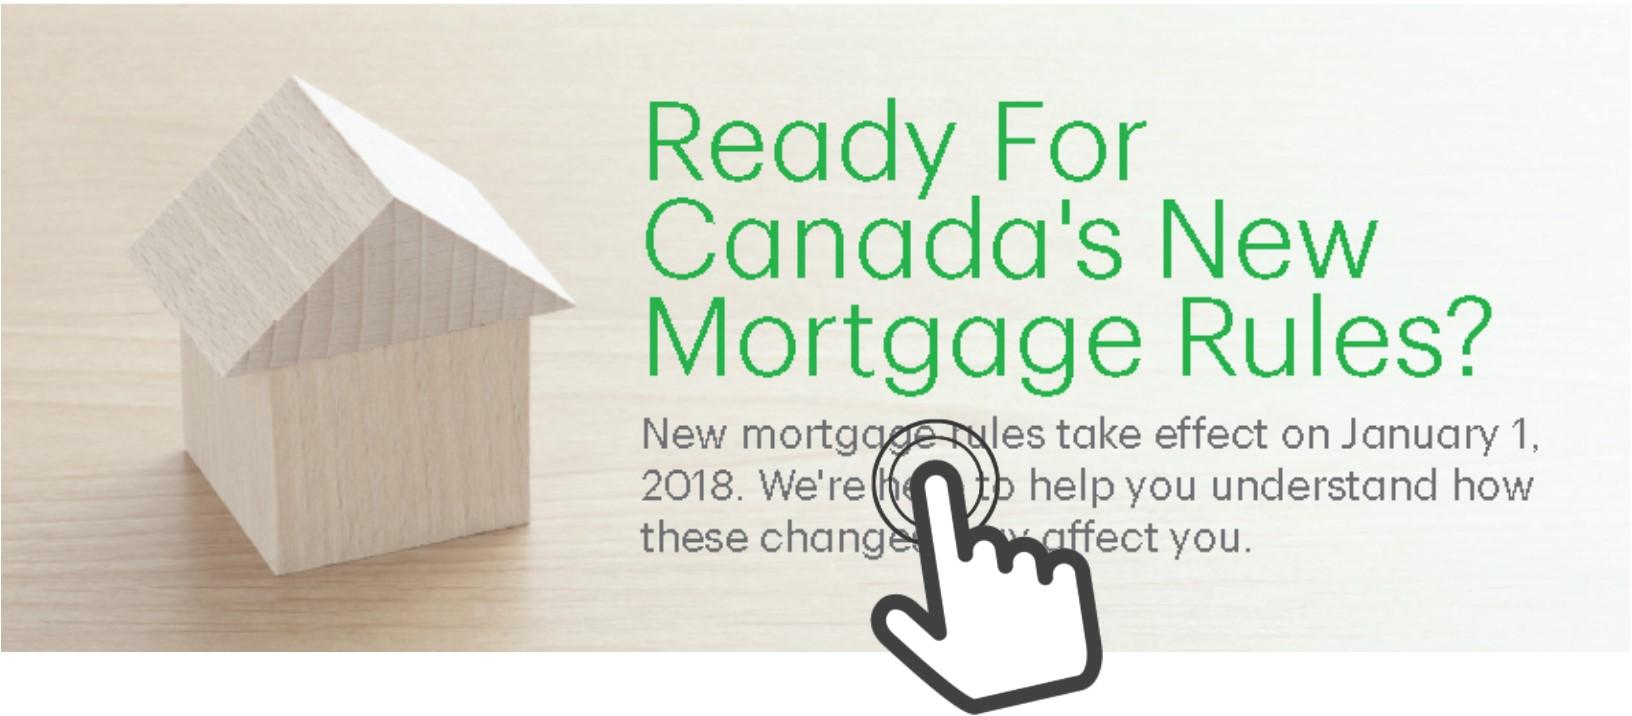 TD Canadian Mortgage Rules.jpg